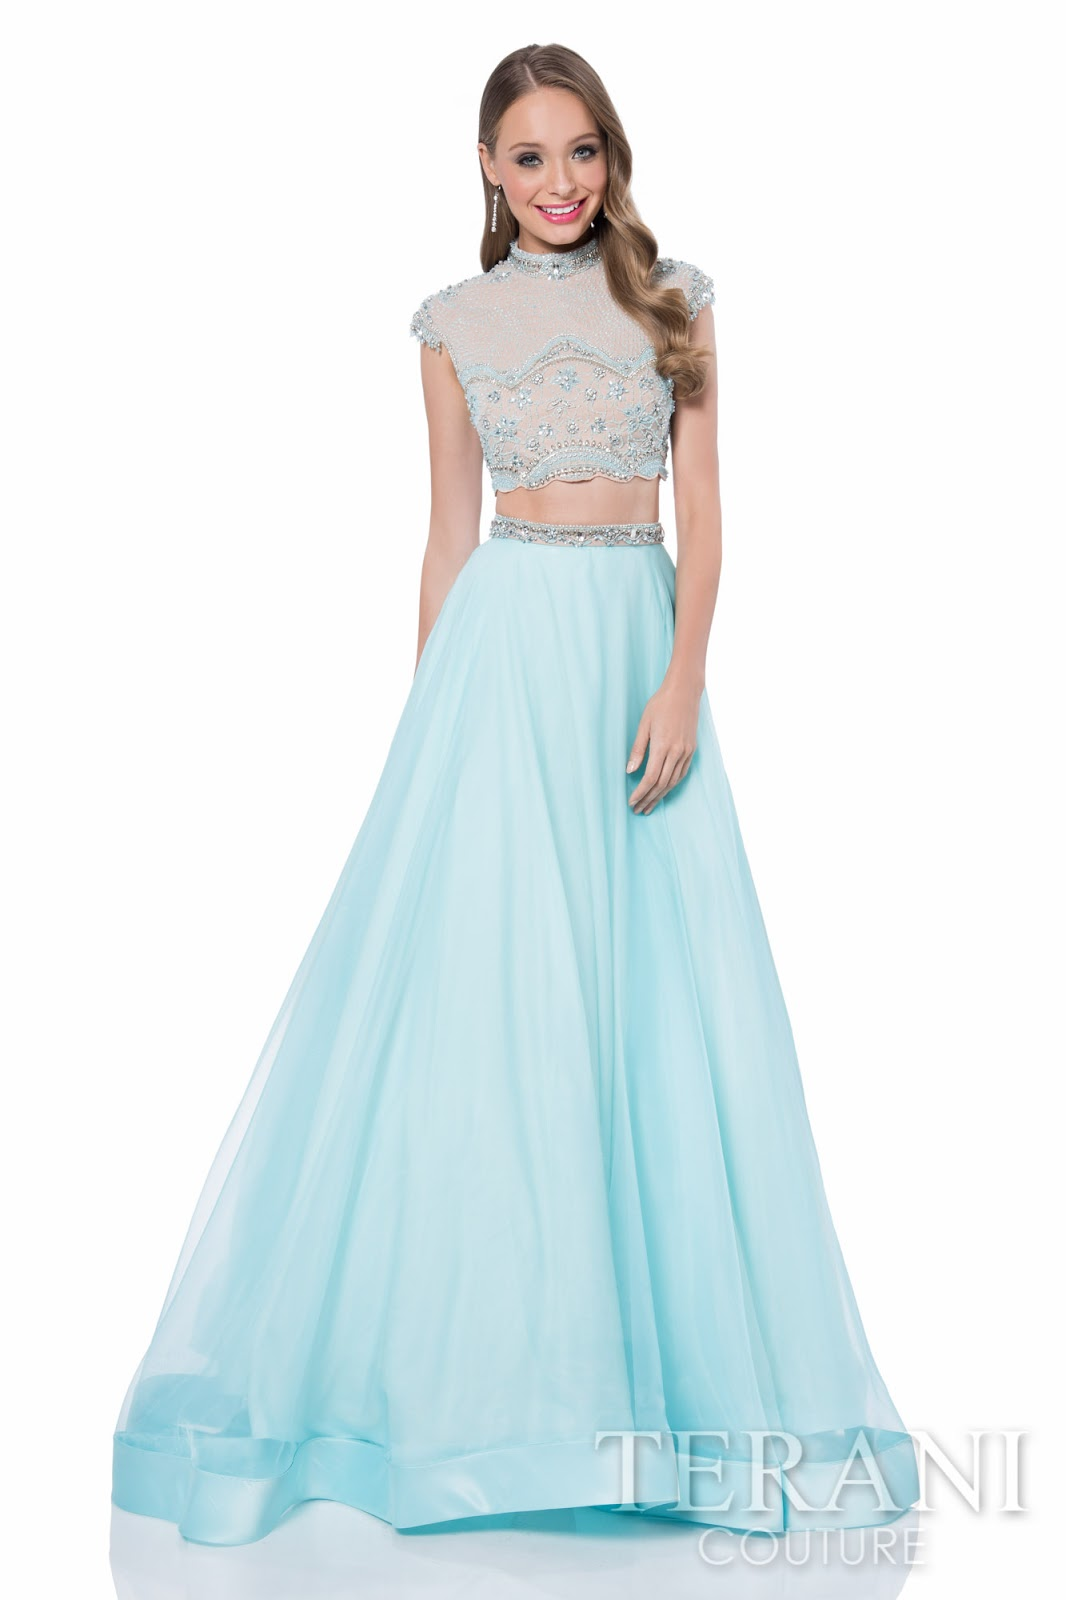 Website For Prom Dresses 89